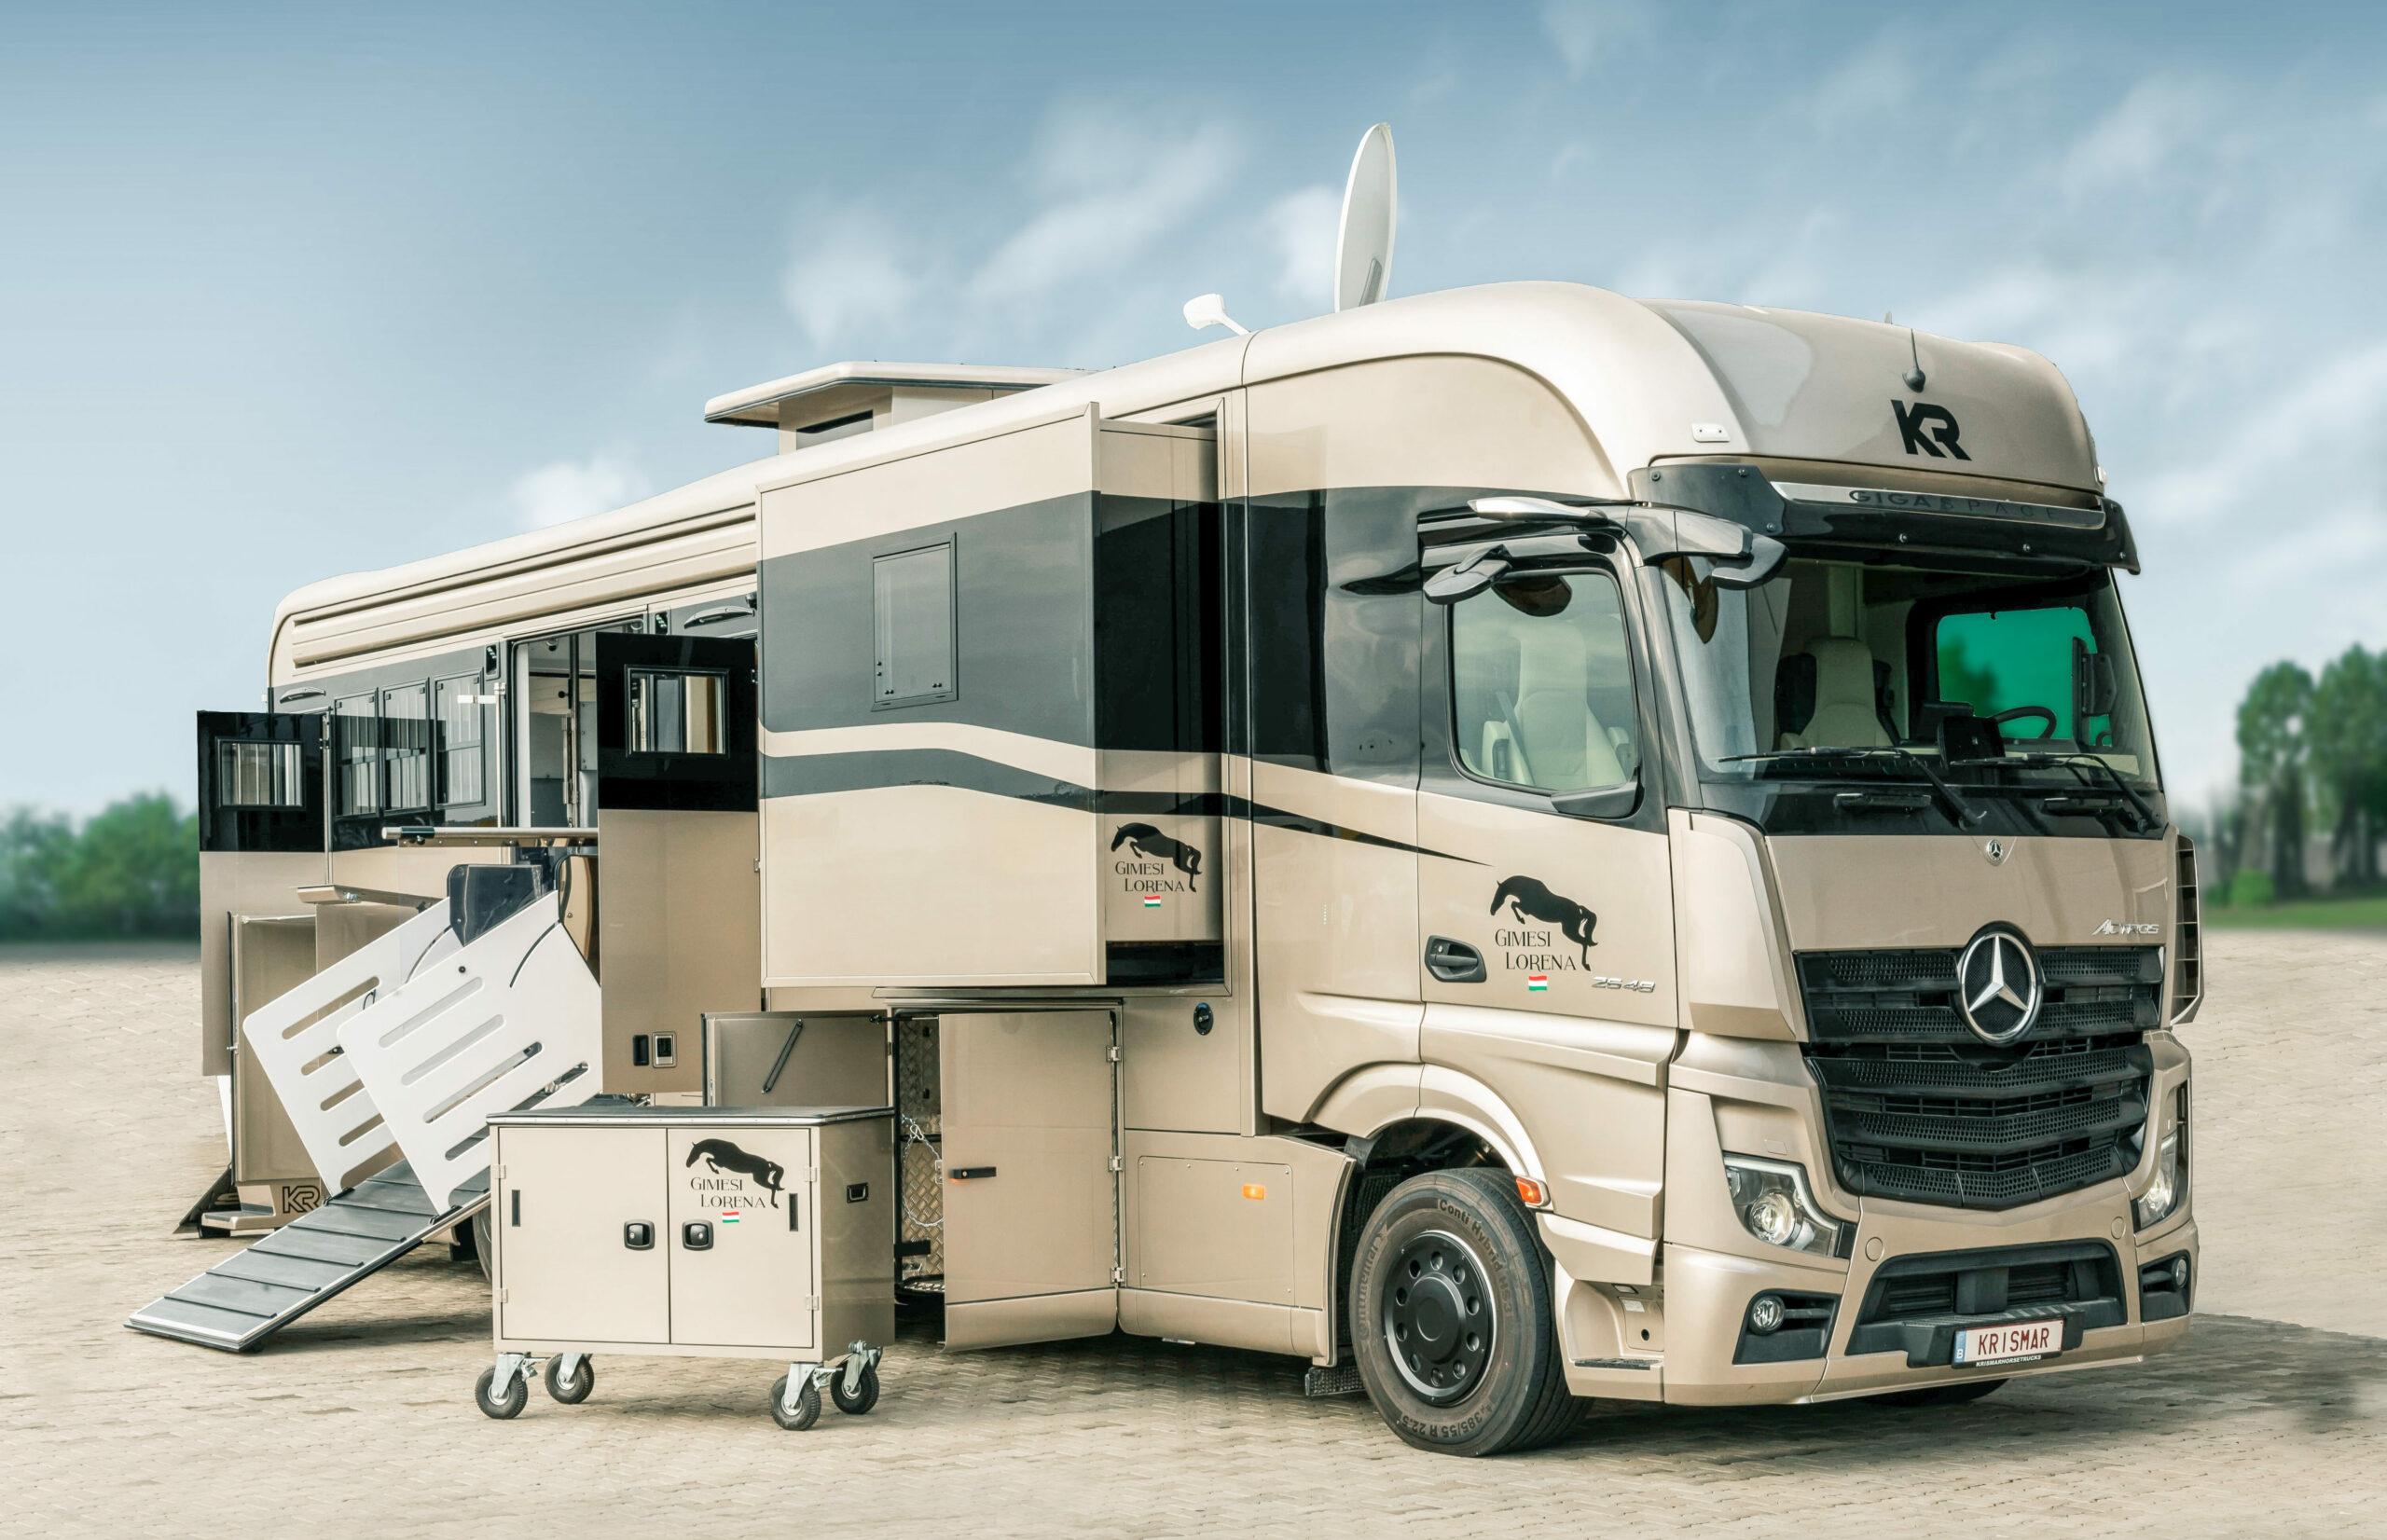 Krismar horse truck exclusieve reeks